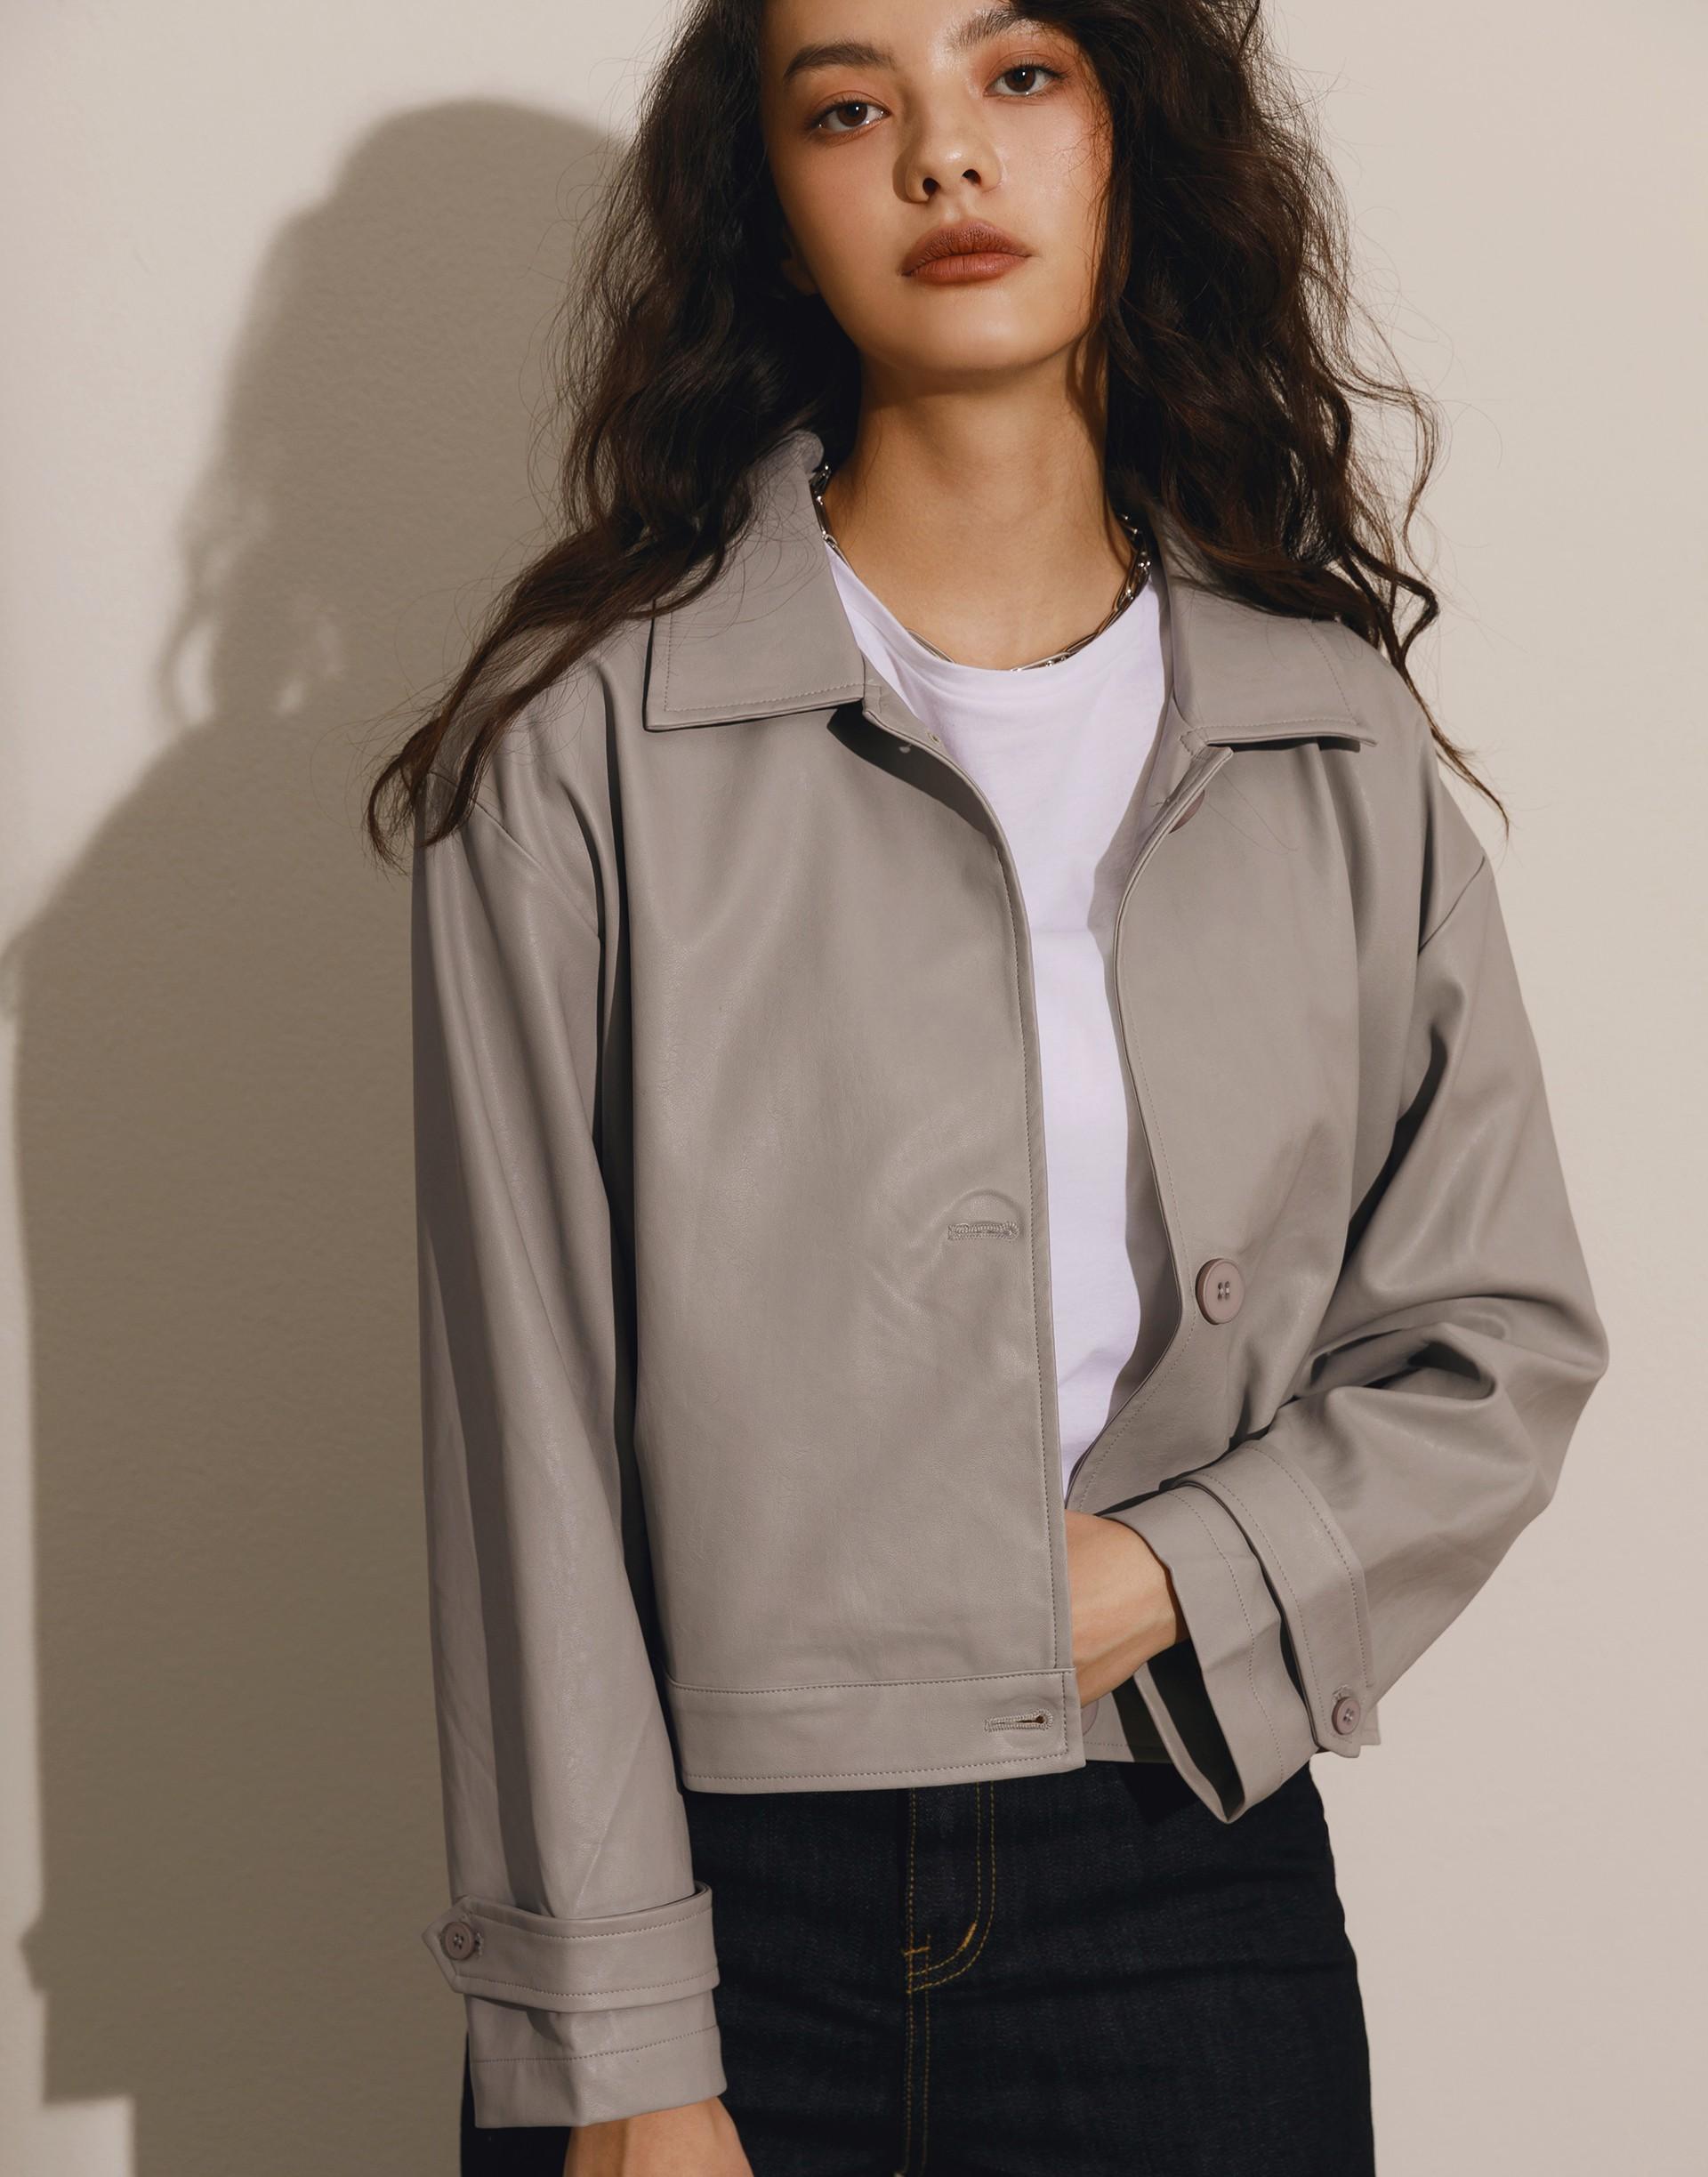 Genquo+簡約質感袖釦皮革外套-女